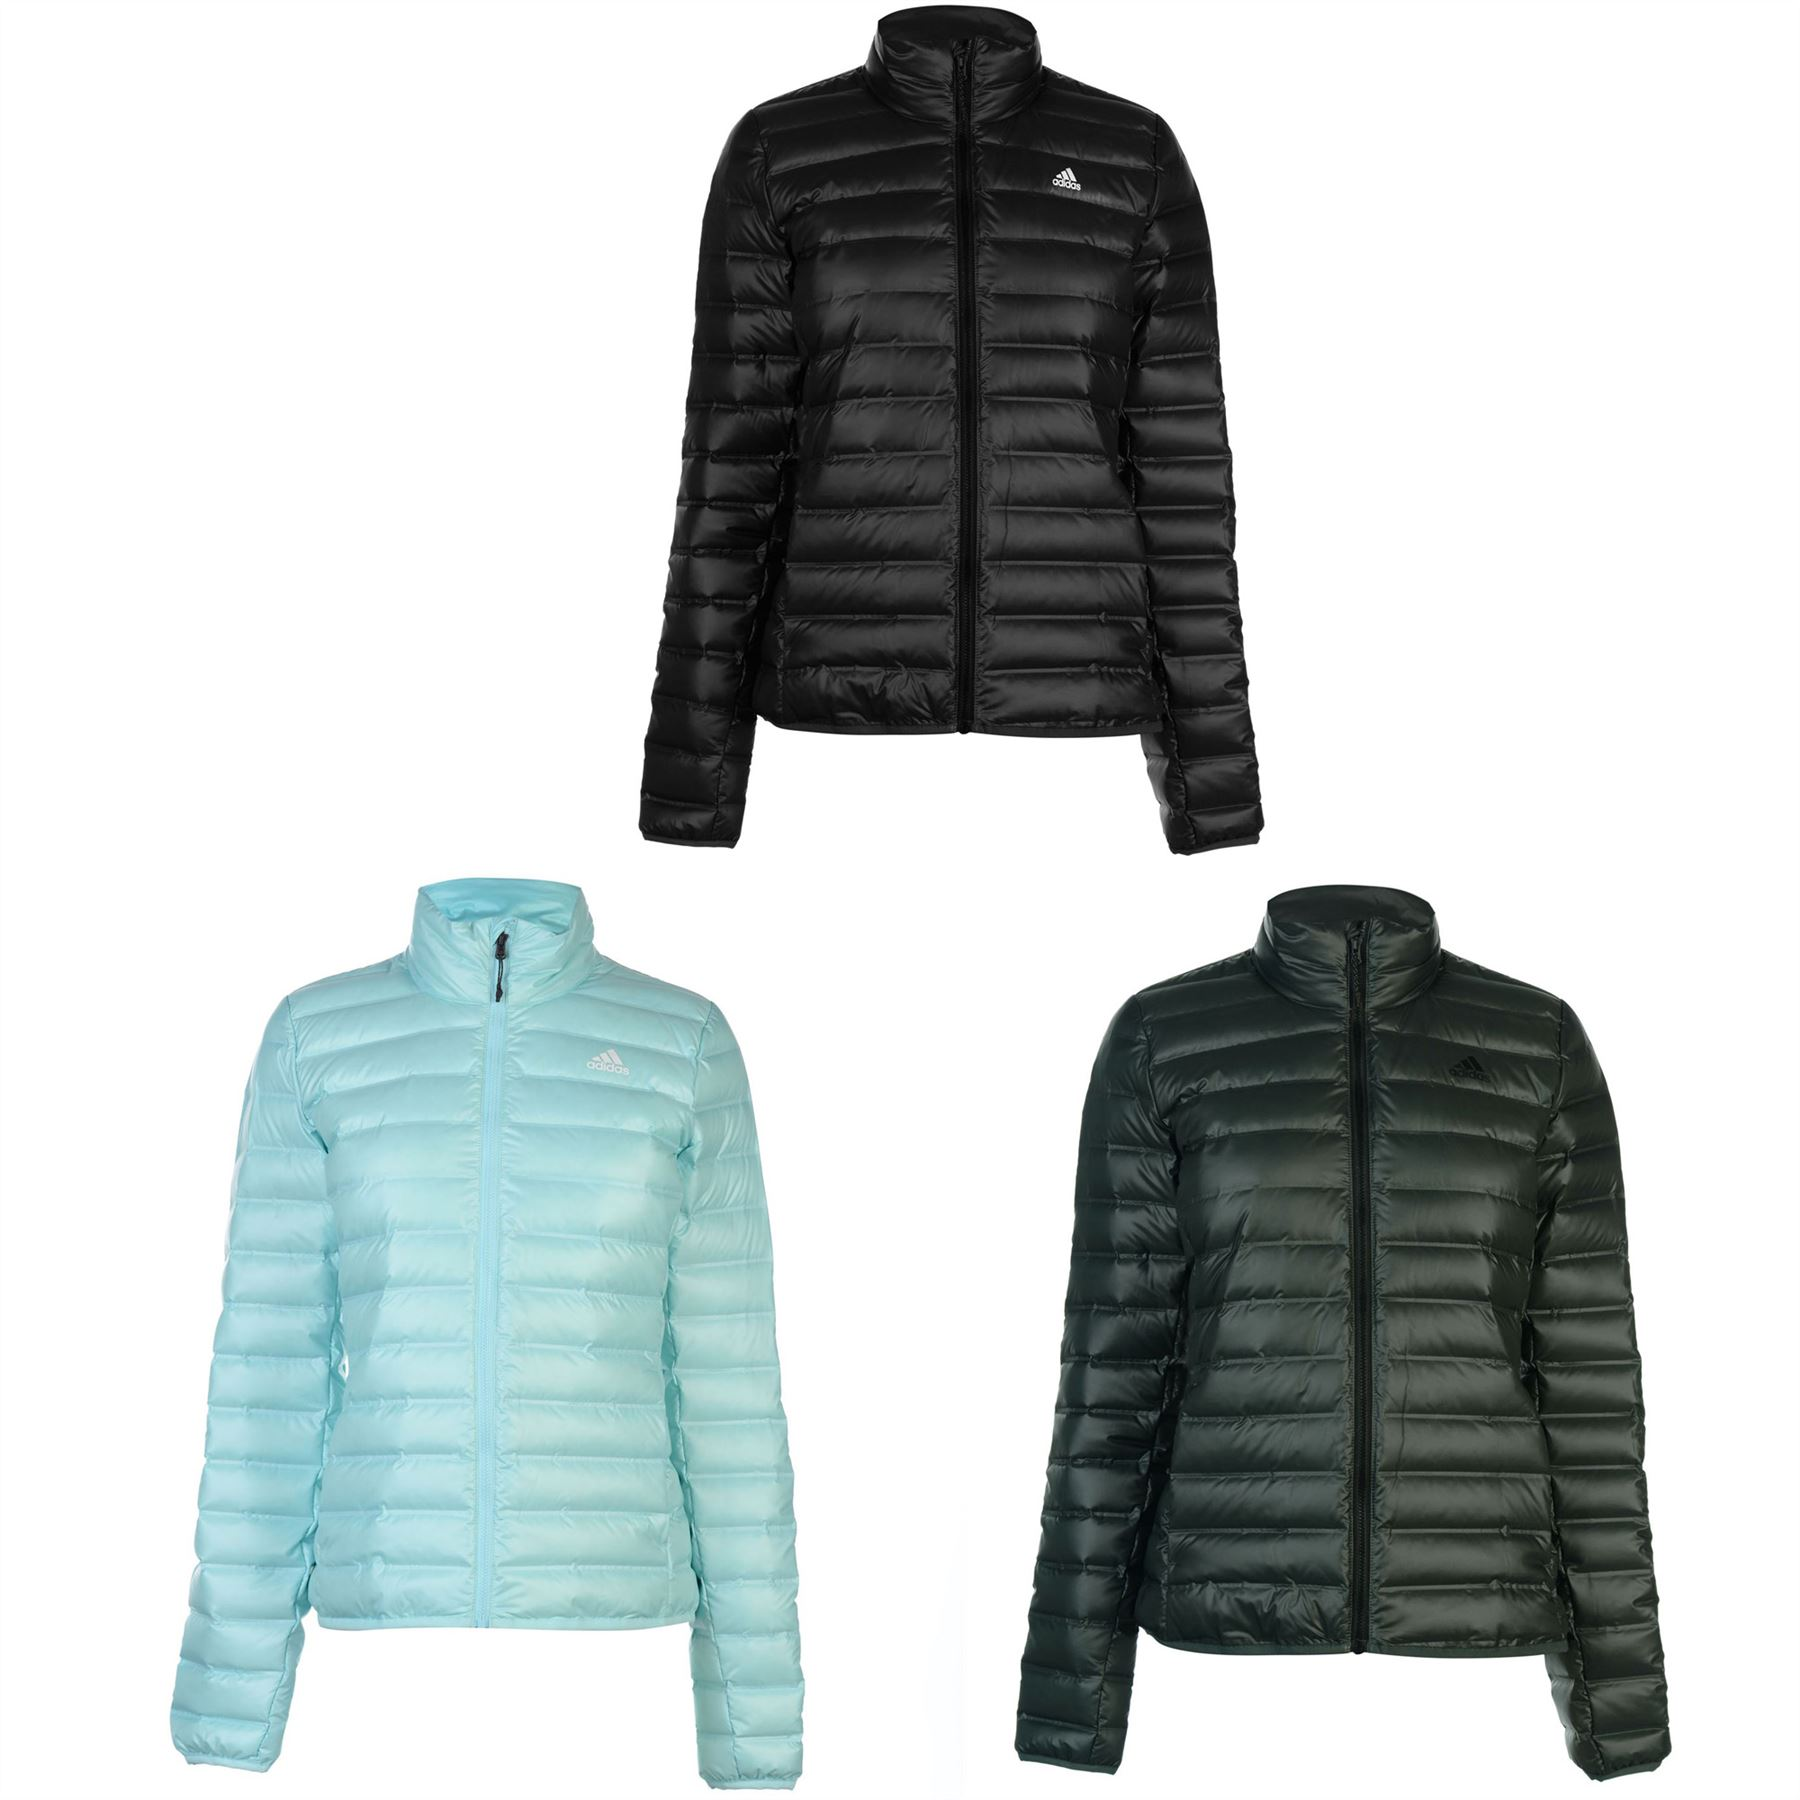 Details about adidas Varilite Jacket Womens Coats Outerwear